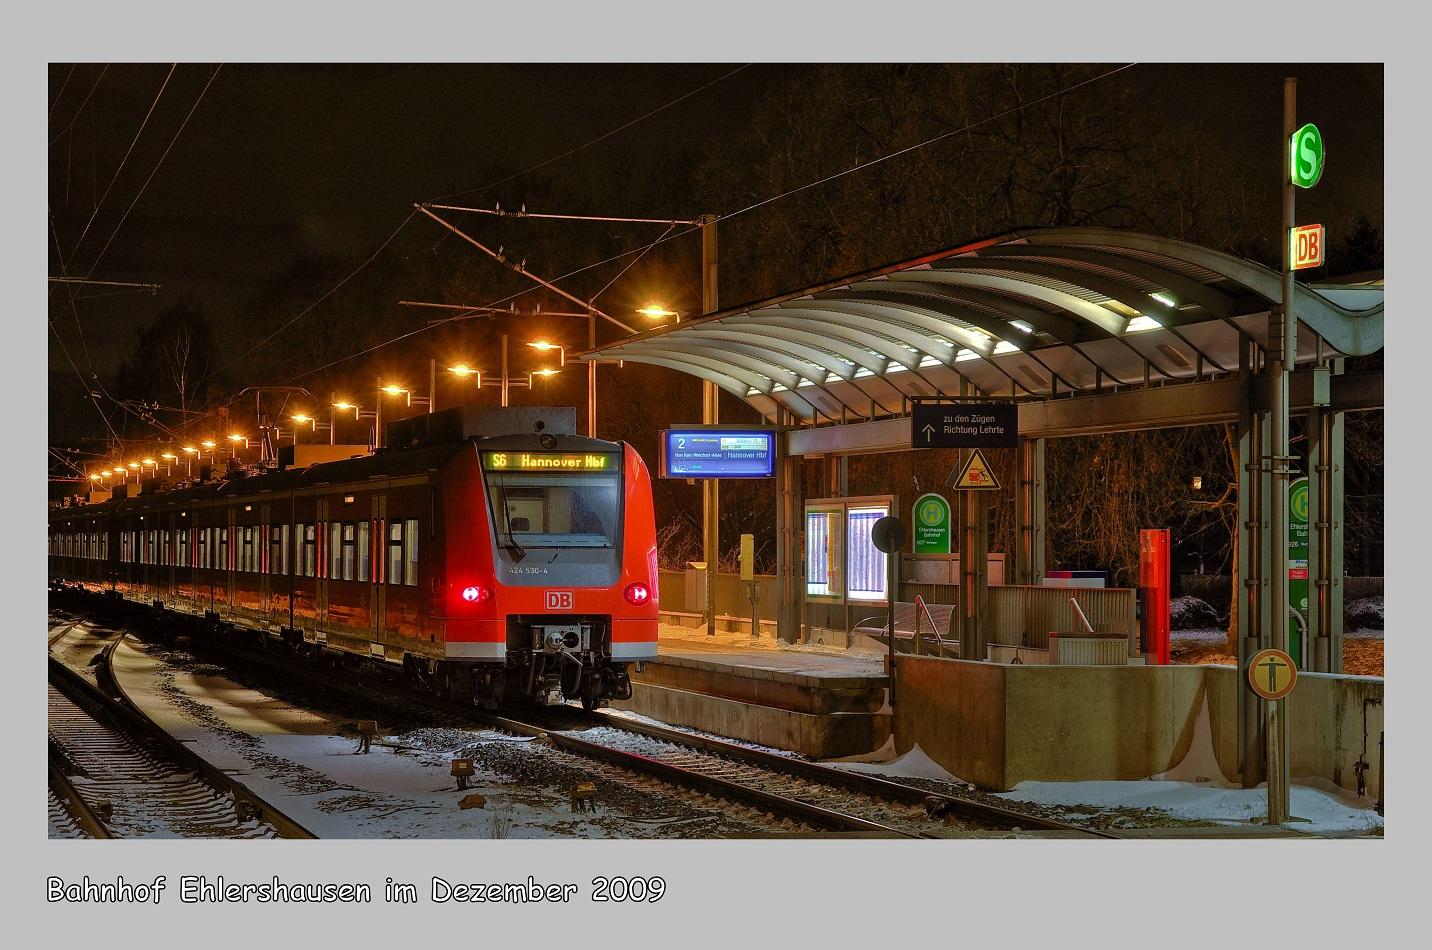 Bahnhof Ehlershausen - S-Bahn